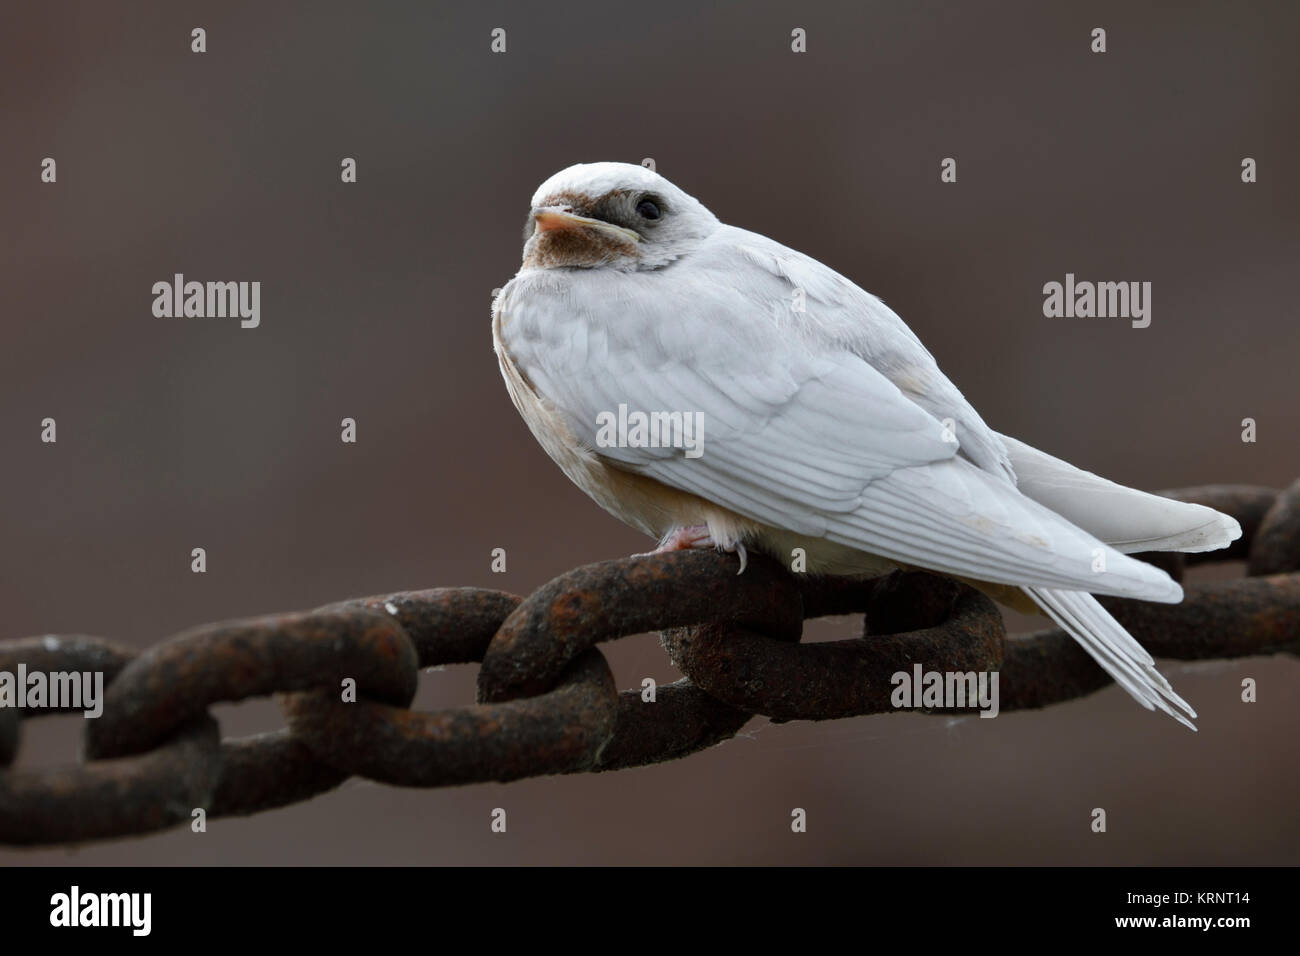 Barn Swallow ( Hirundo rustica ), just fledged, gene defect, white plumage, leucistic, leucism, perched on a massive - Stock Image